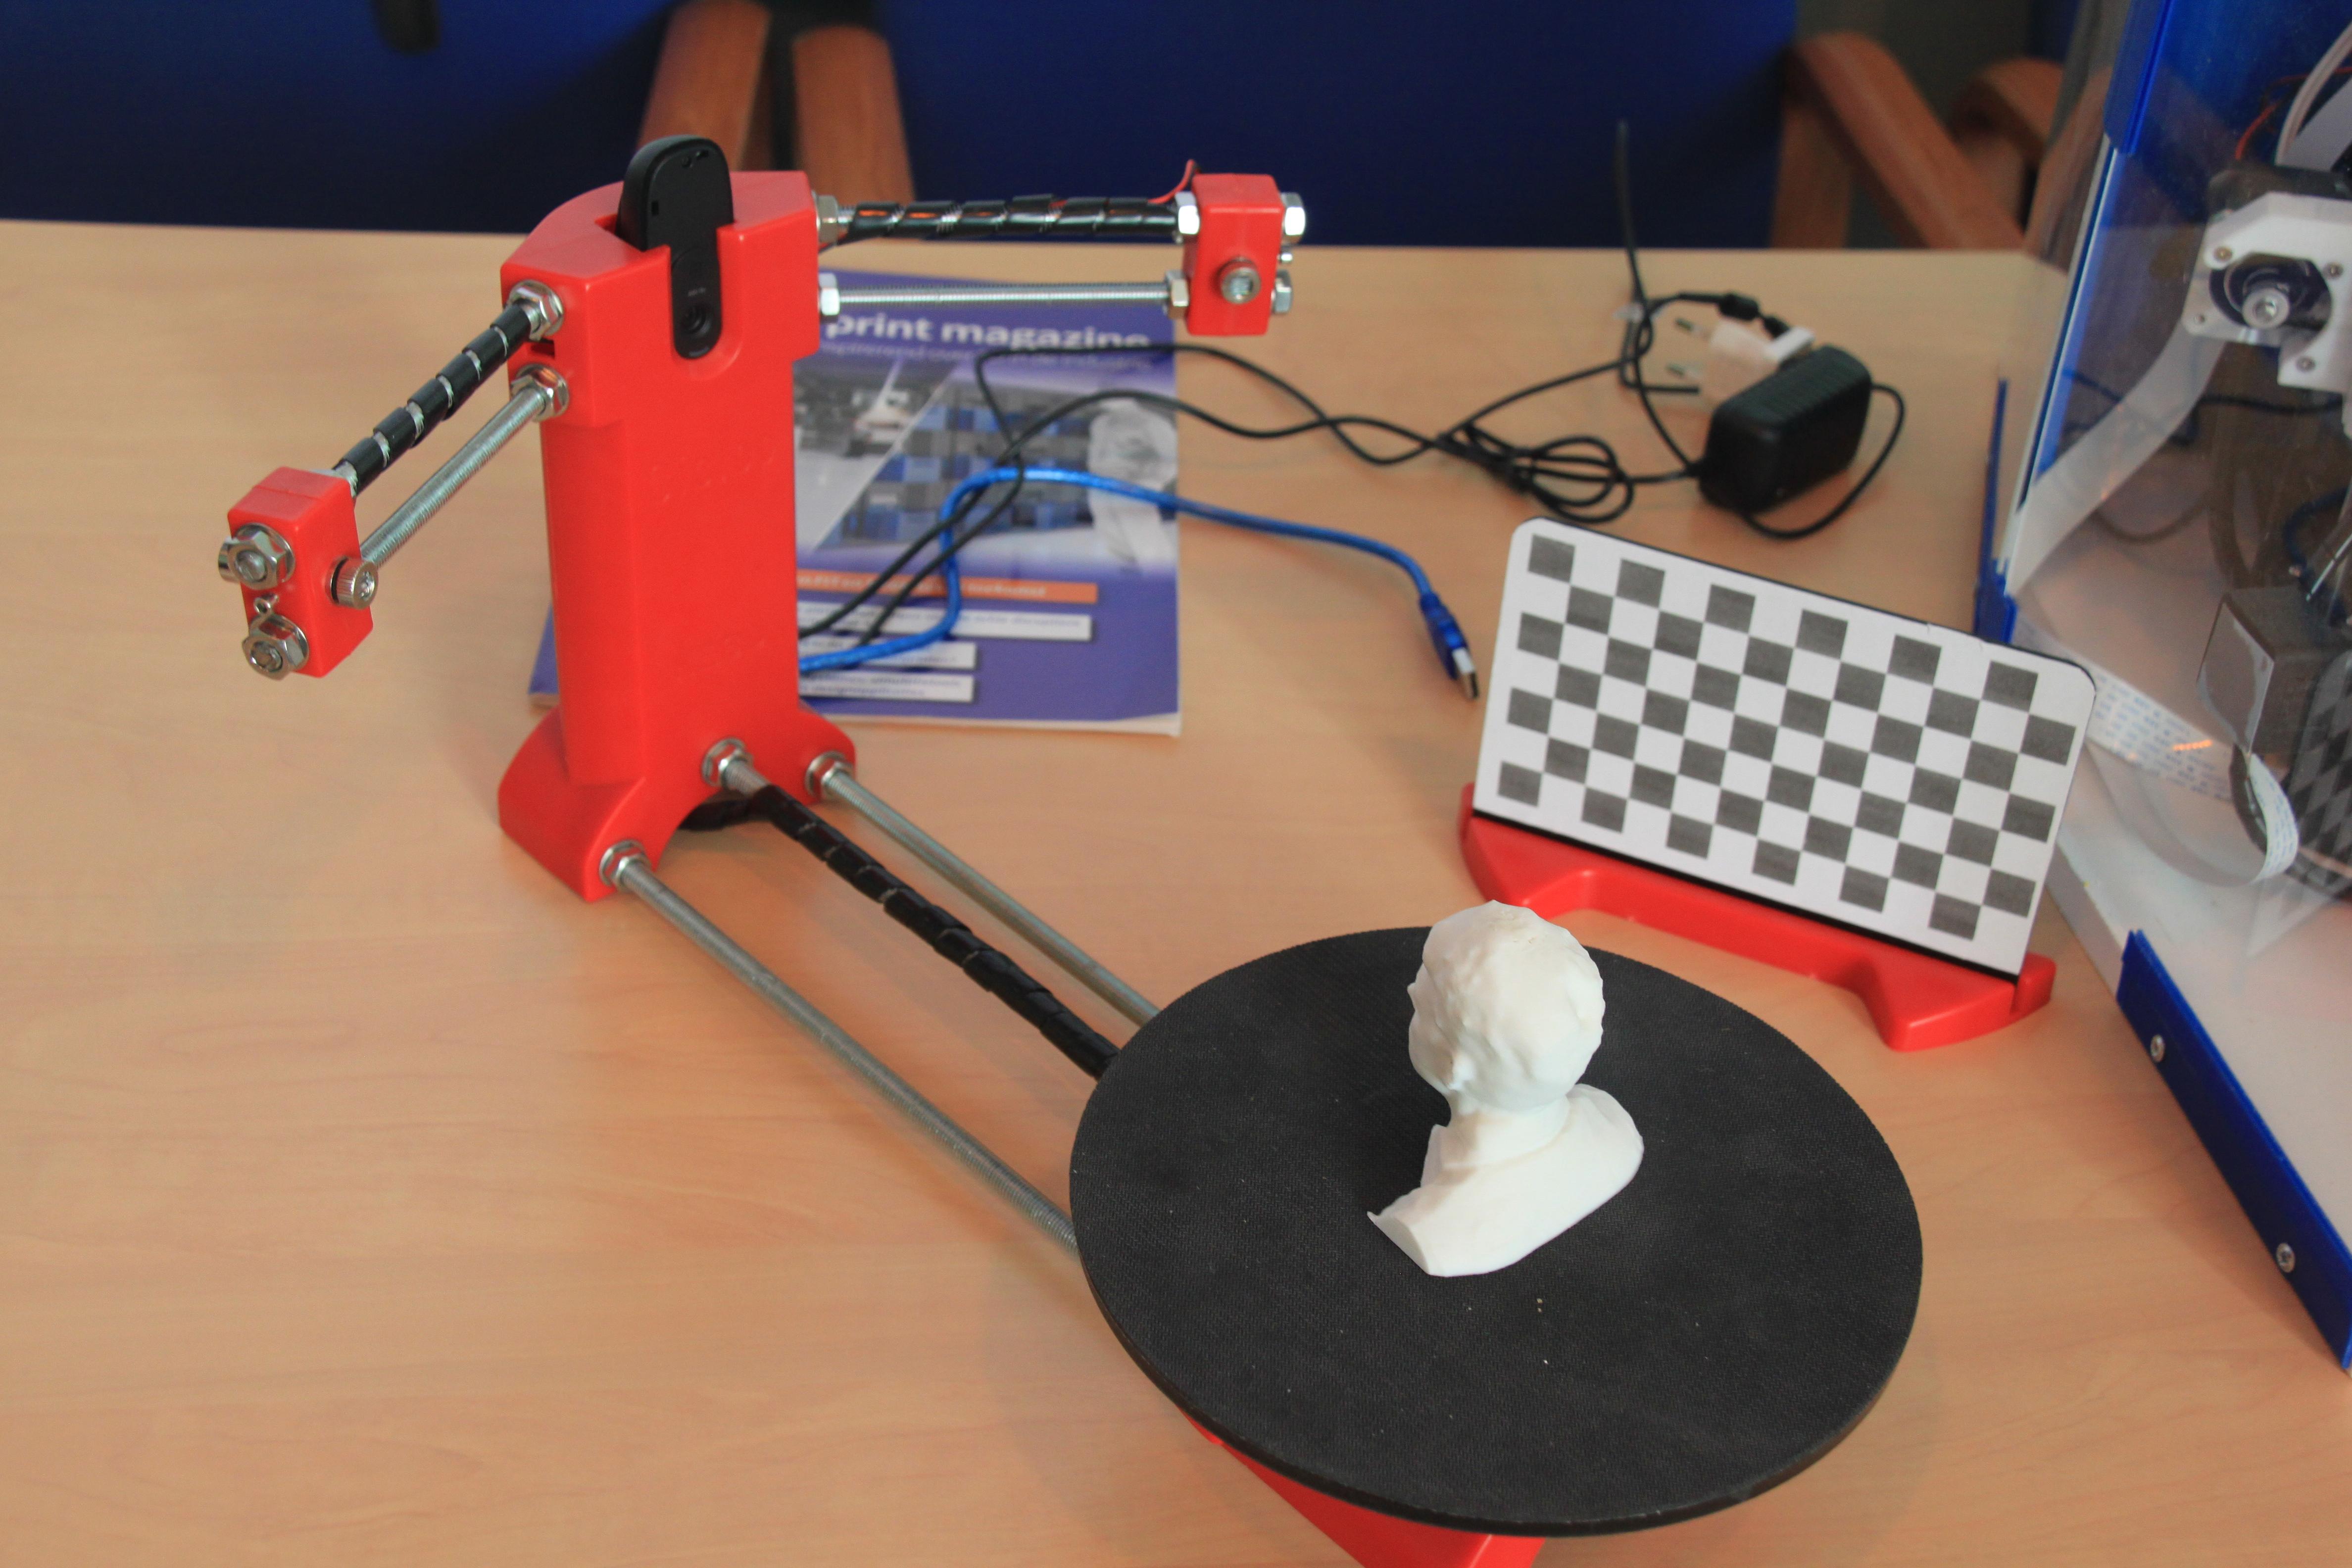 2017-06-07 - 08 - 3D printing demo HCC!Noord-Limburg